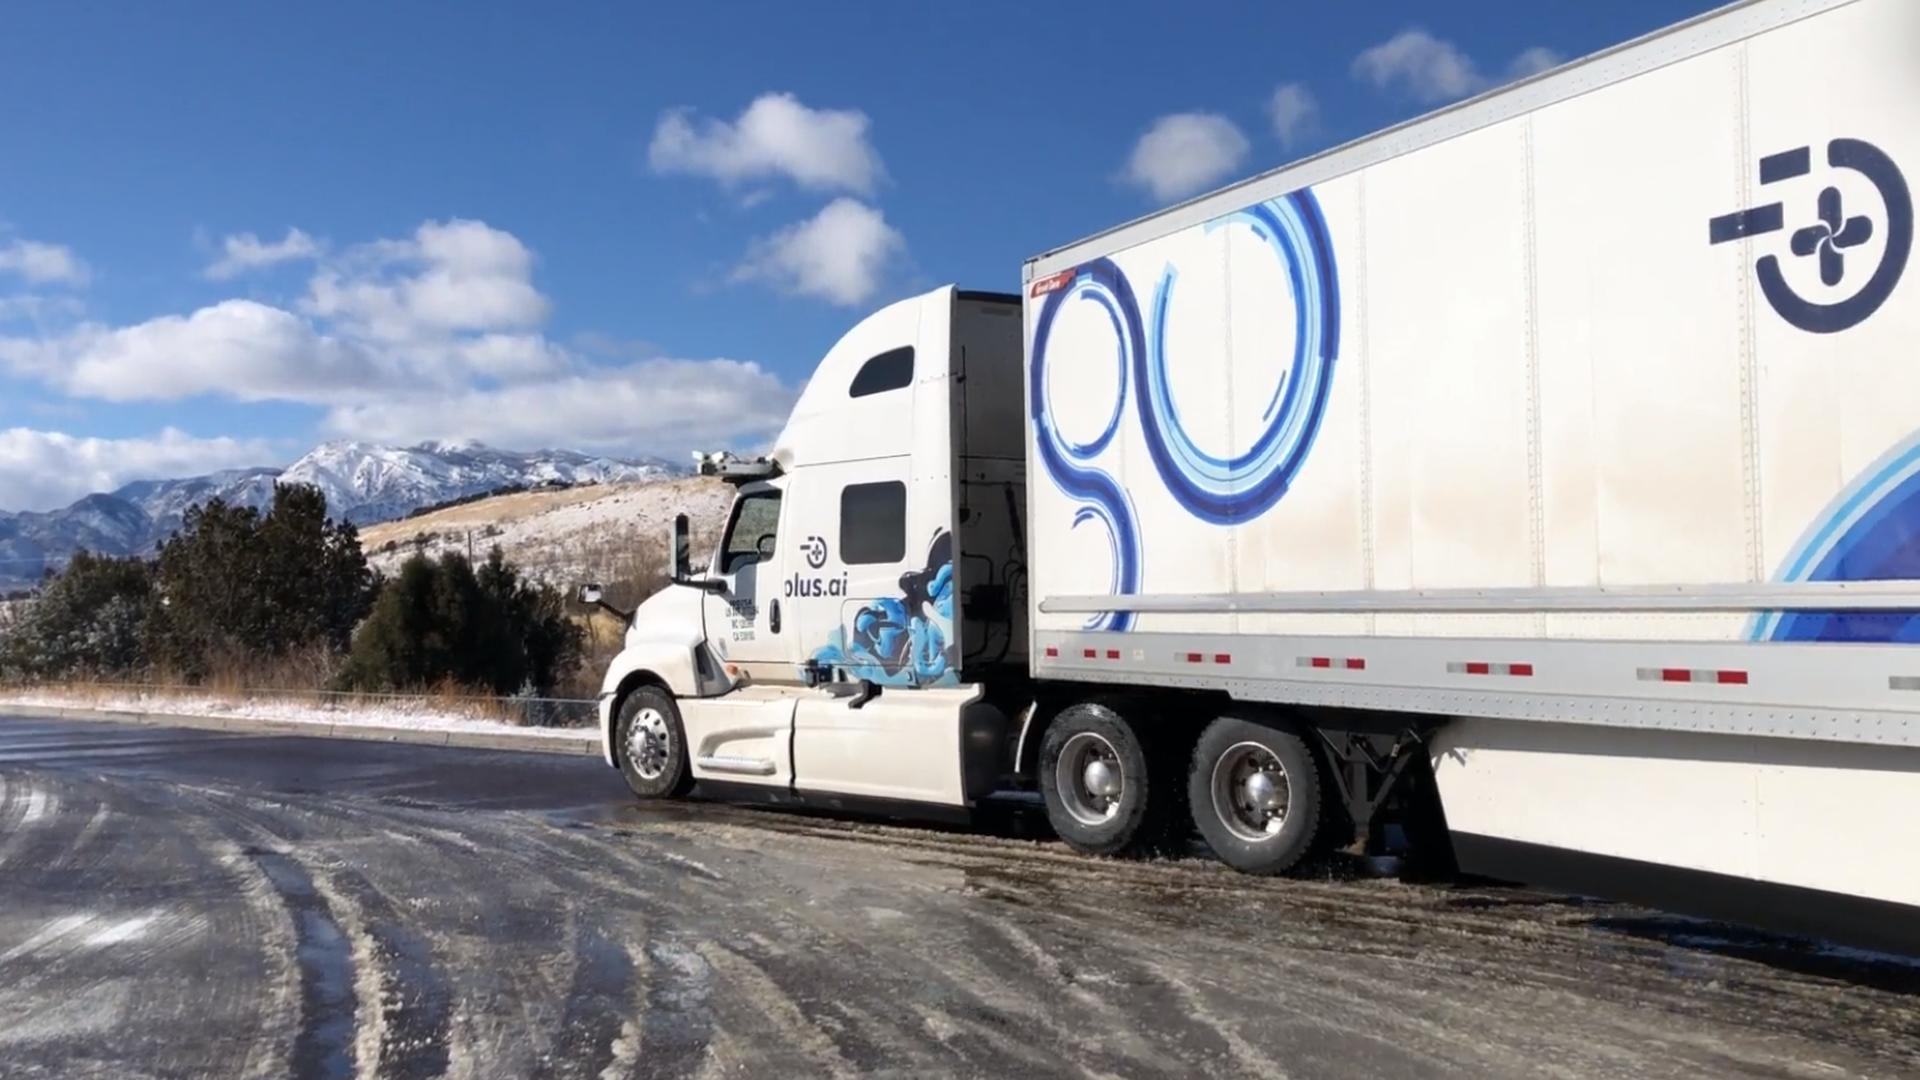 Self-driving truck makes historic cross-country trek